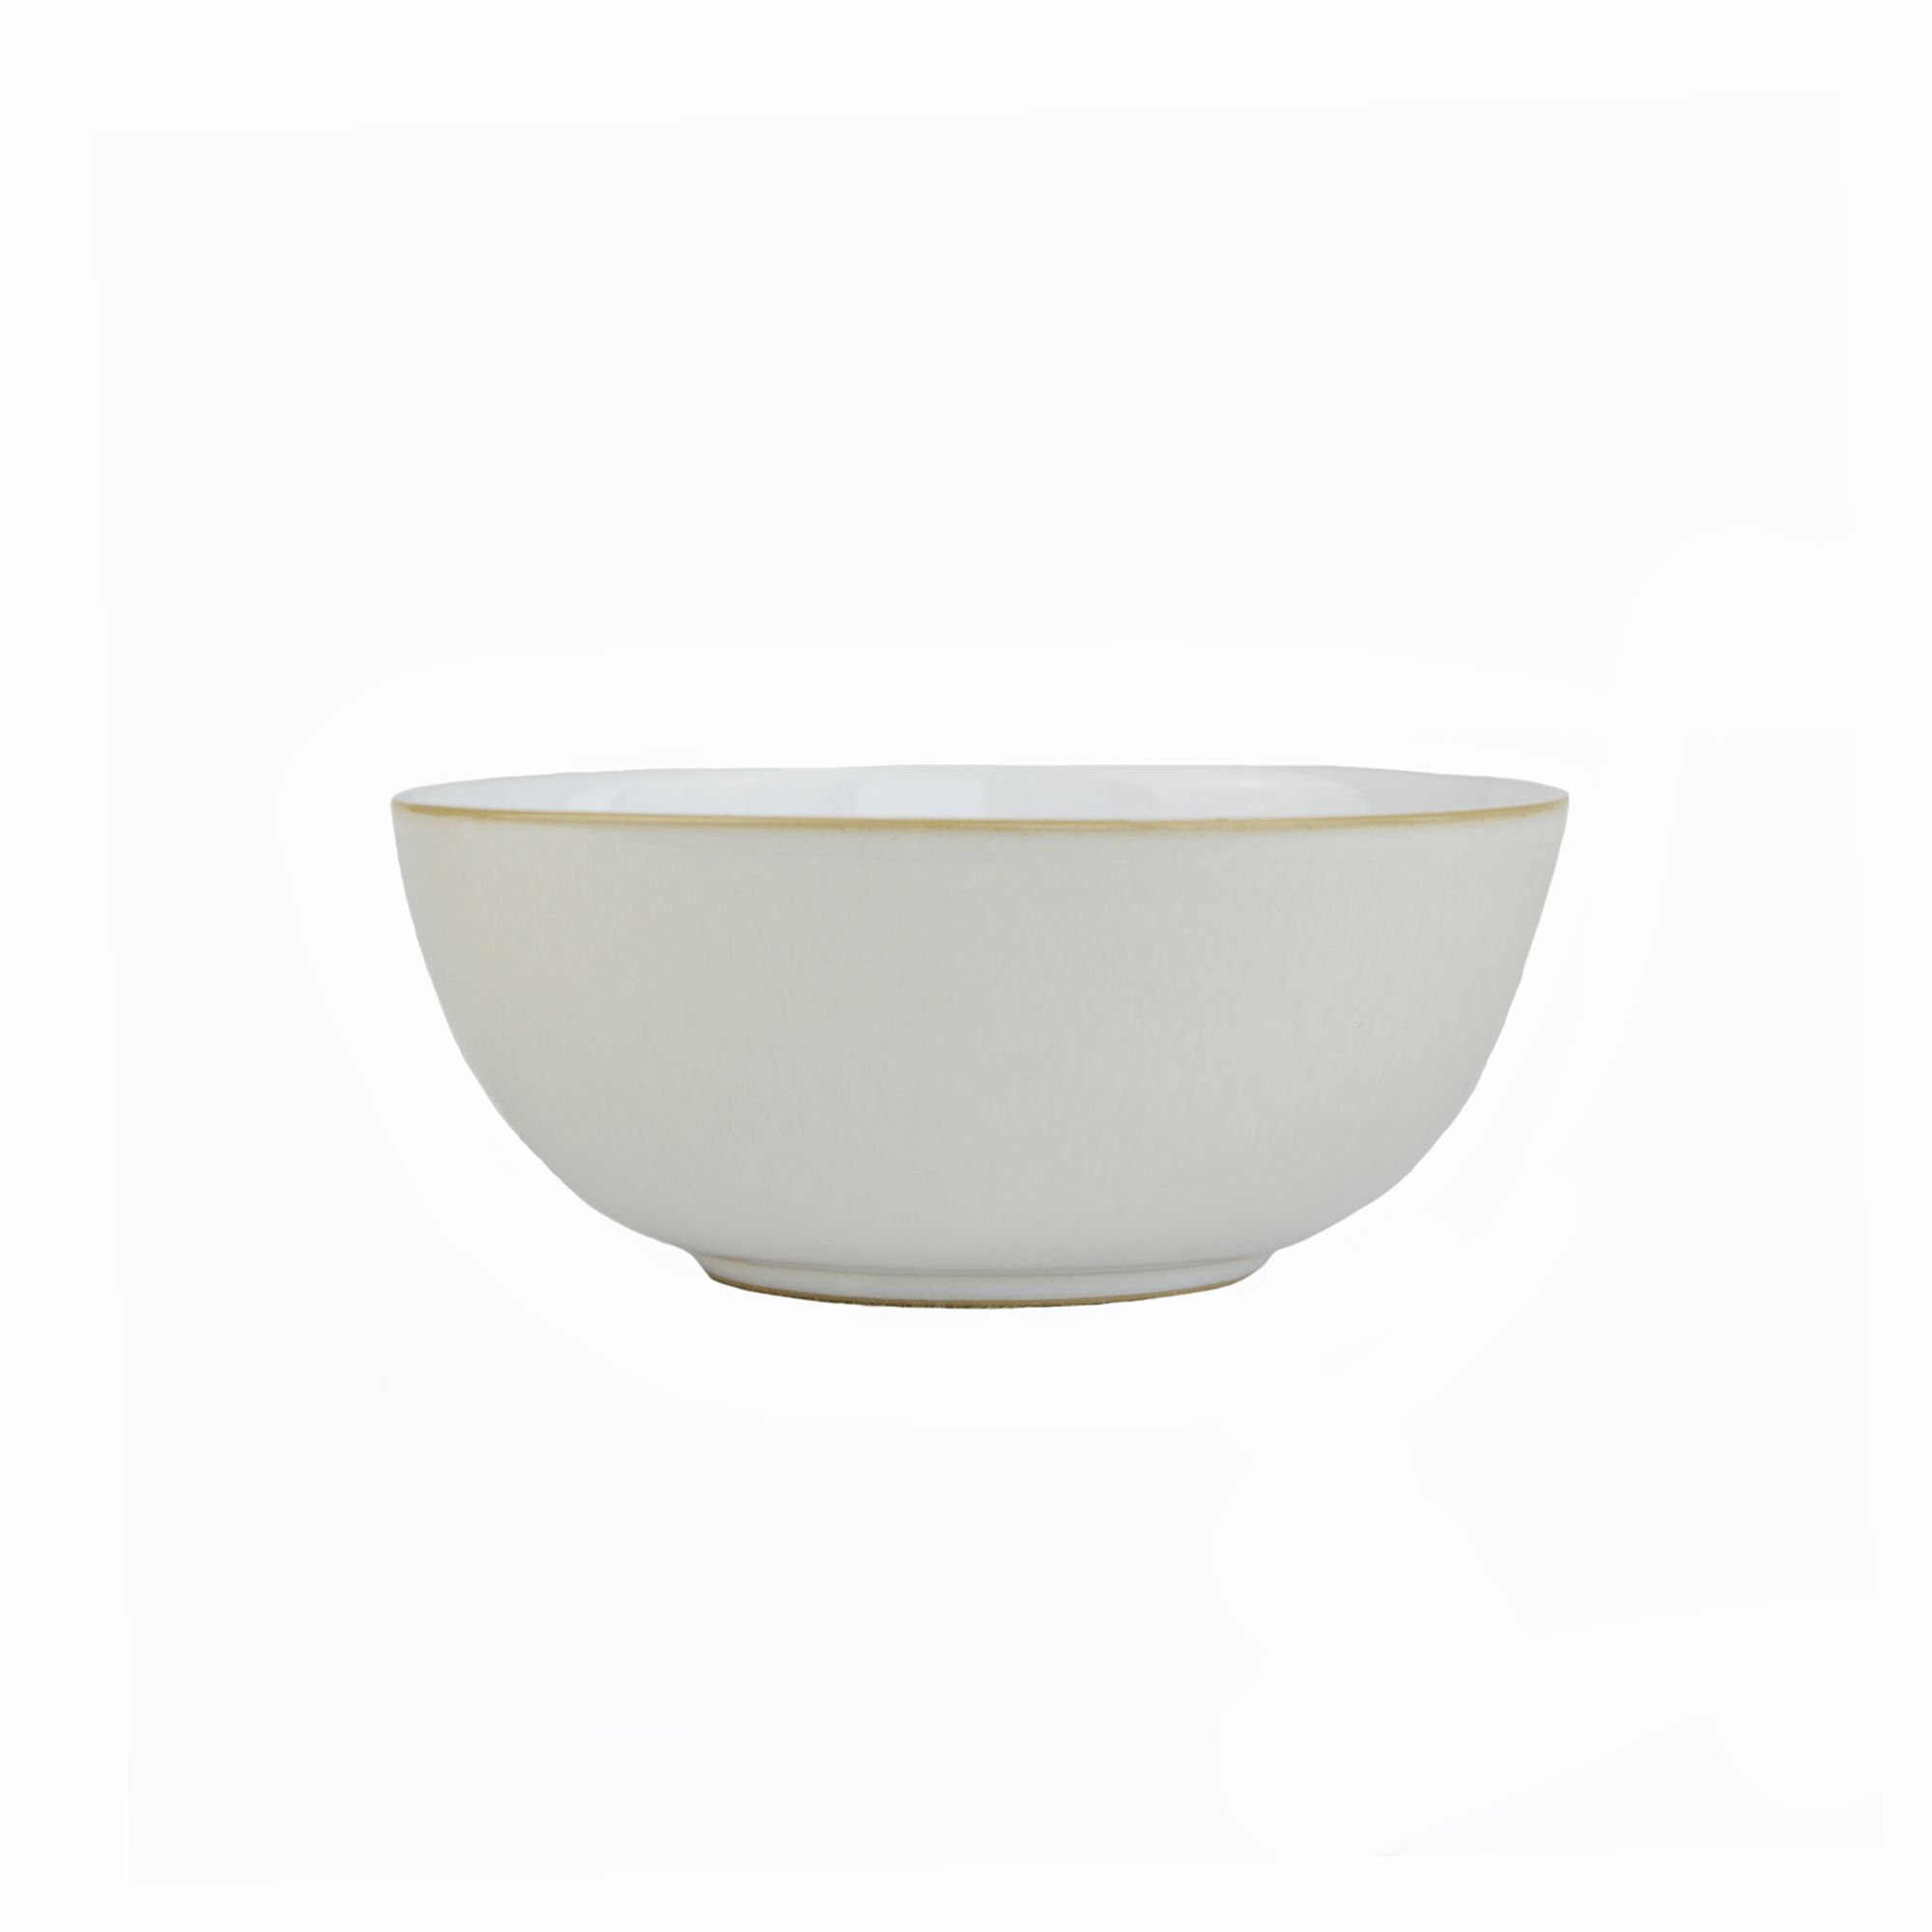 Denby Natural Canvas Cereal Bowl All Tableware Amp Dine